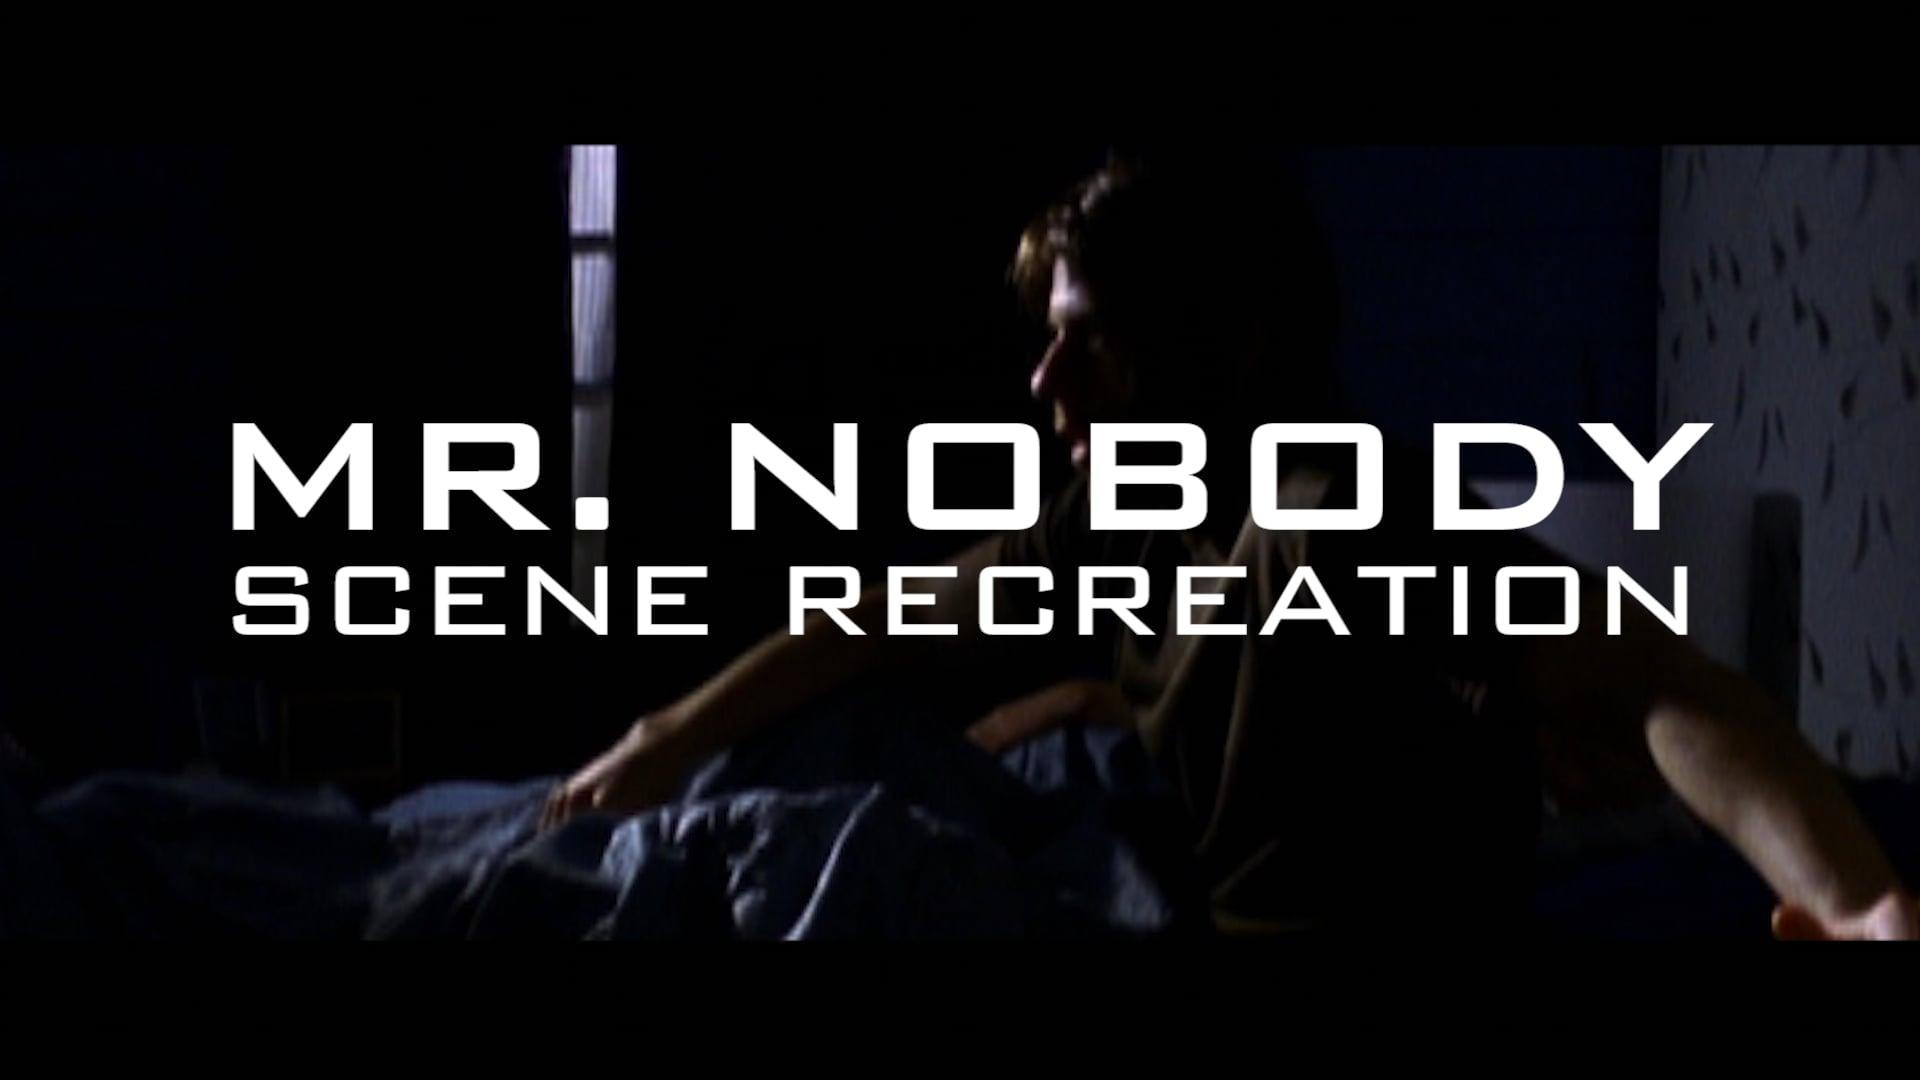 Mr. Nobody - Scene recreation